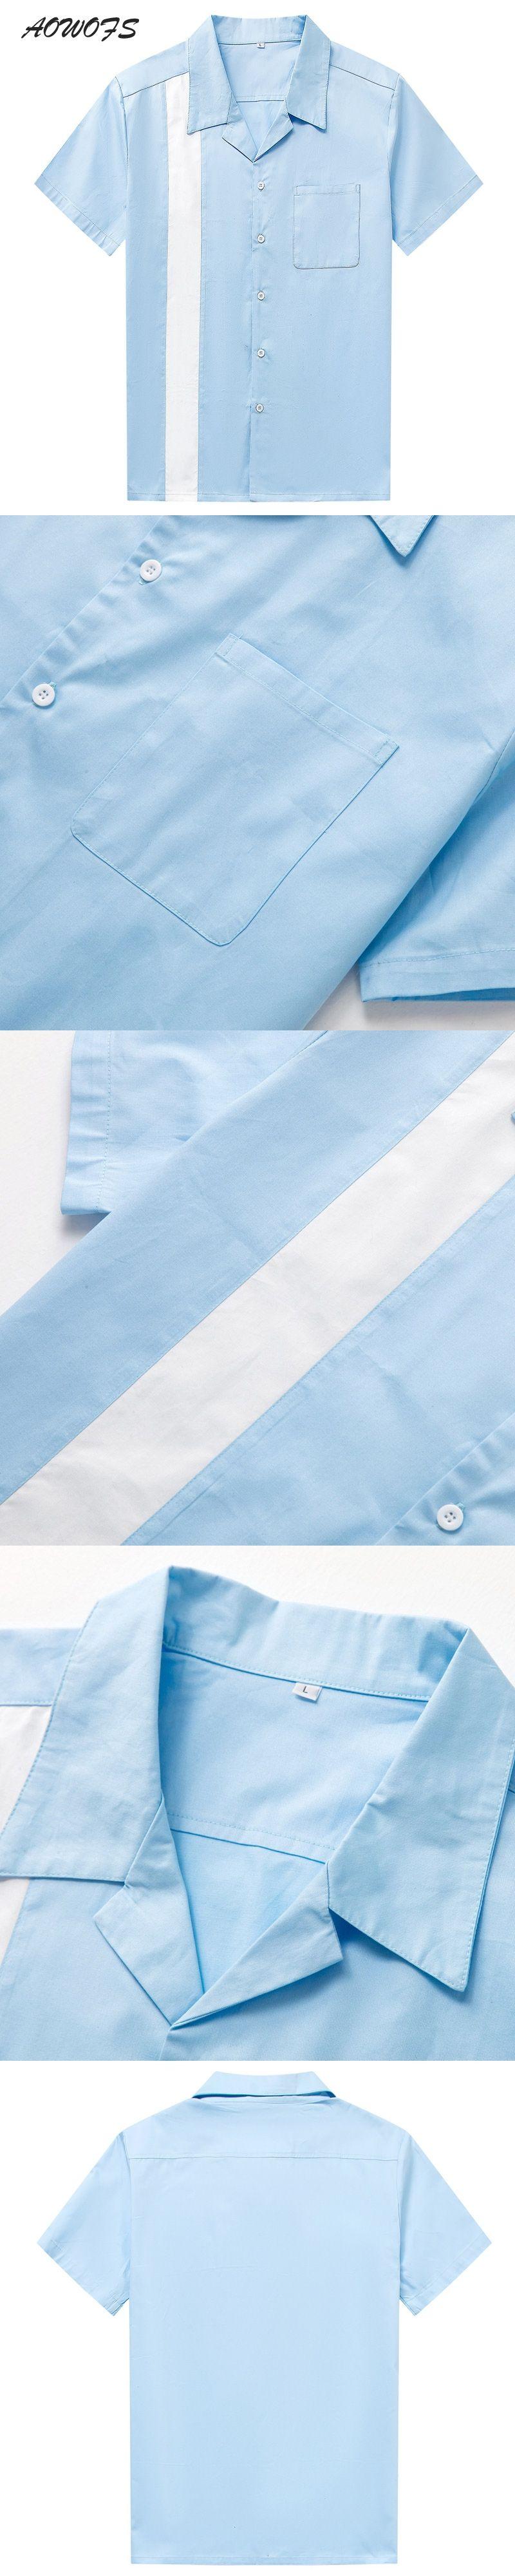 e848afc61f9 AOWOFS 2018 Spring Vintage Fashion Shirts Men Short Sleeve Cotton  Rockabilly Men Big Sizes Blue White